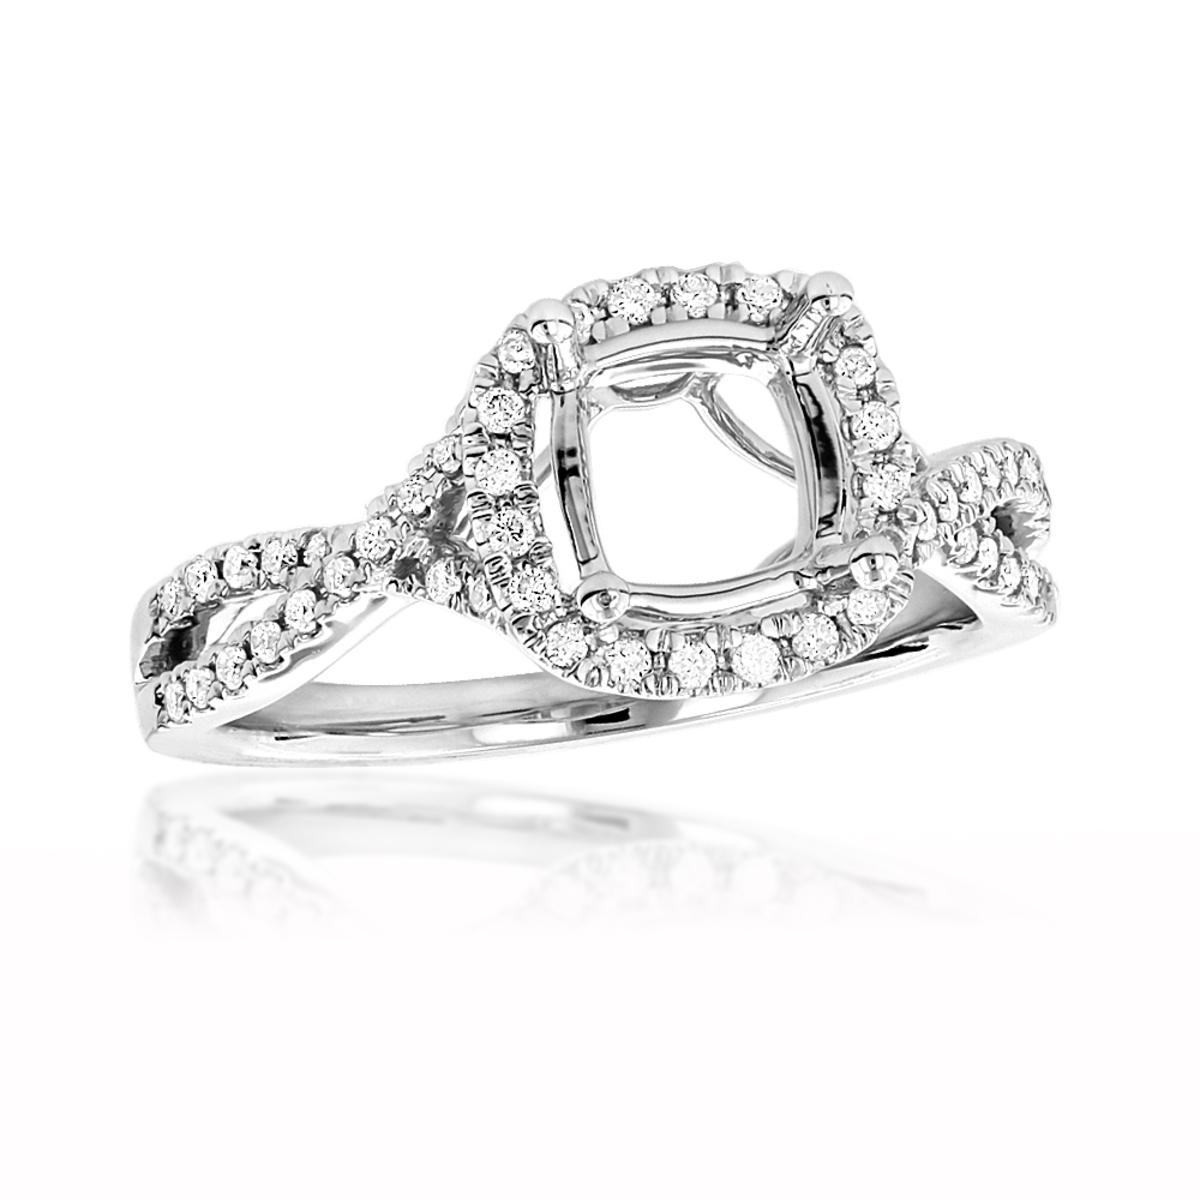 Halo Cushion Cut Diamond Engagement Ring Mounting 0.4ct 18K Gold